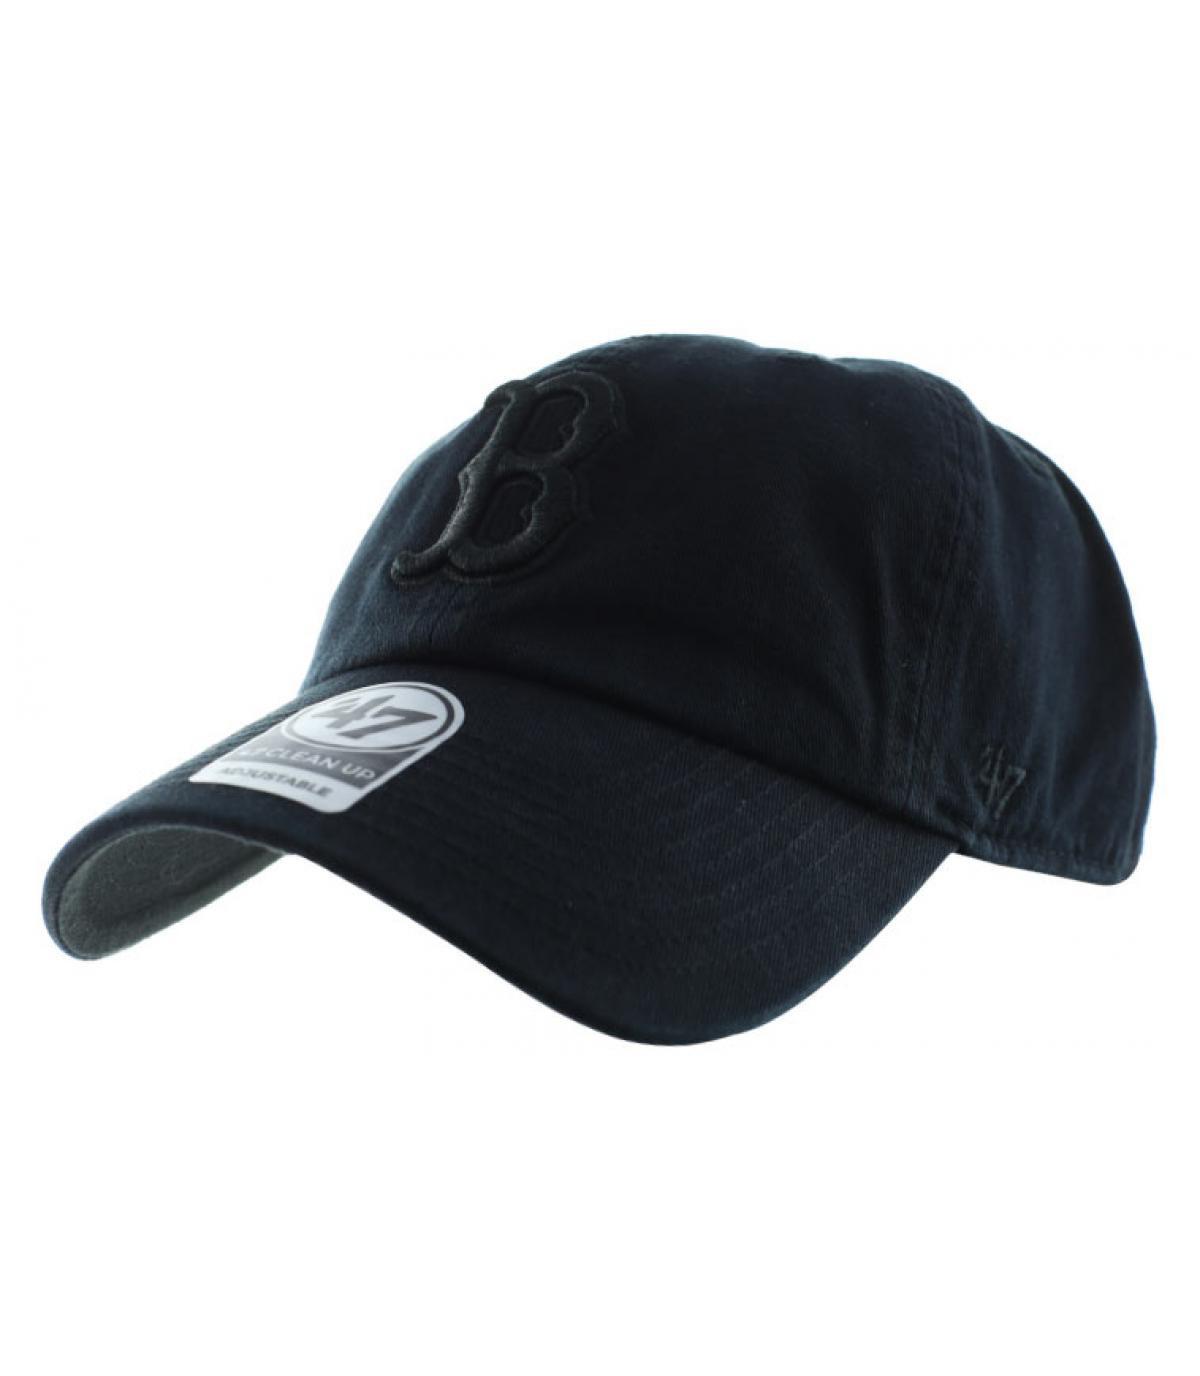 casquette curve Boston noire